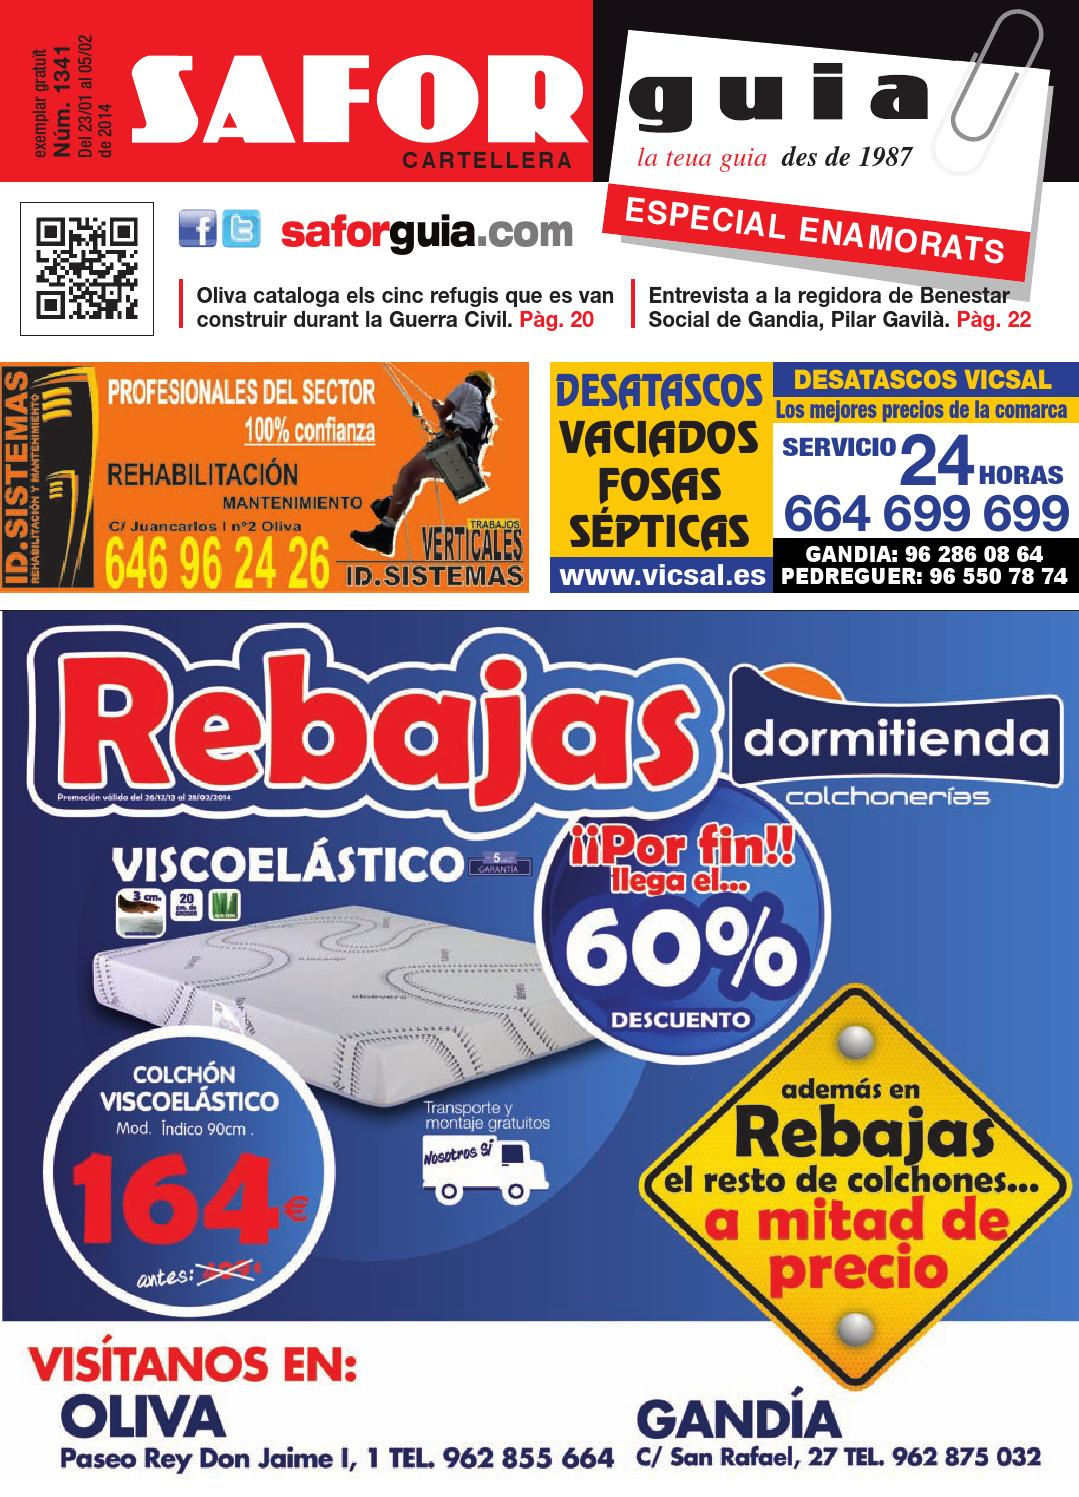 Publicaci N Del 23 De Enero Al 5 De Febrero De 2014 By Saforguia  # Muebles Peiro Quart De Poblet